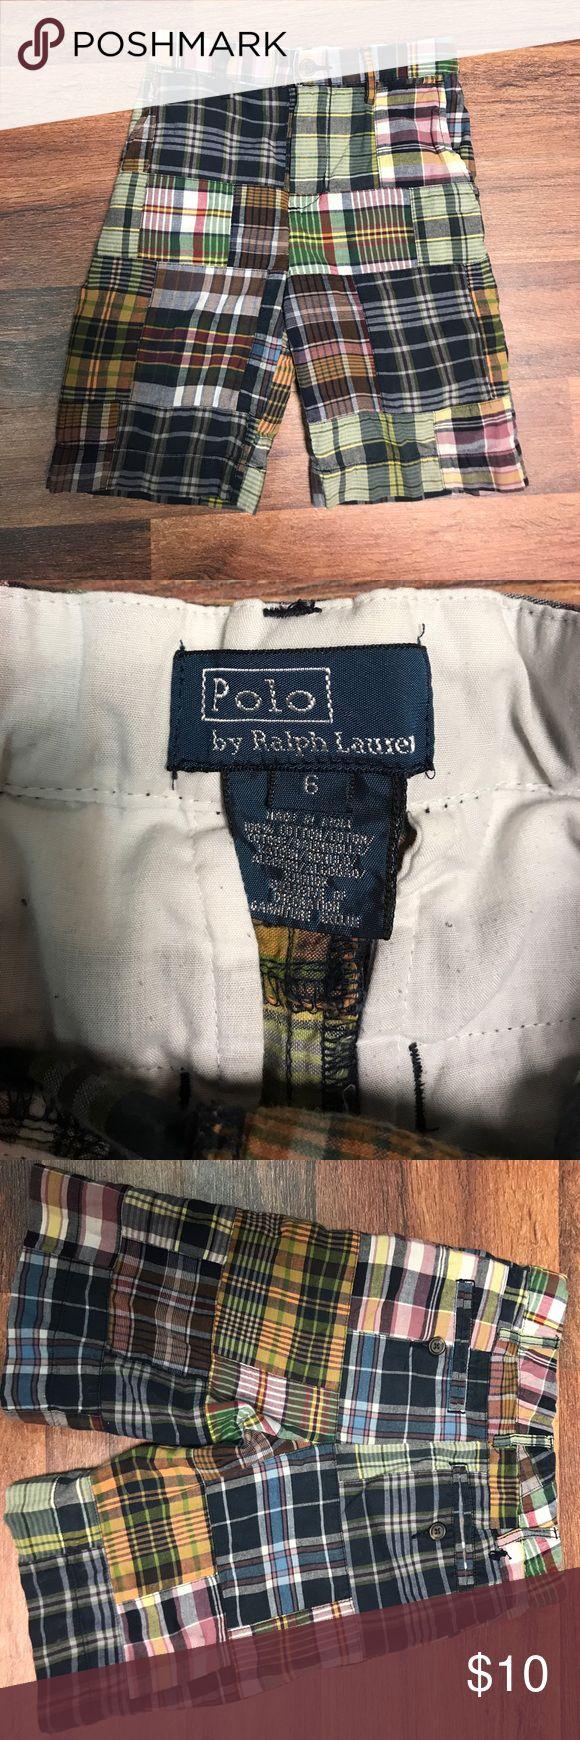 Polo by Ralph Lauren Shorts Size 6 little boys! GREAT CONDITION! Polo by Ralph Lauren Bottoms Shorts